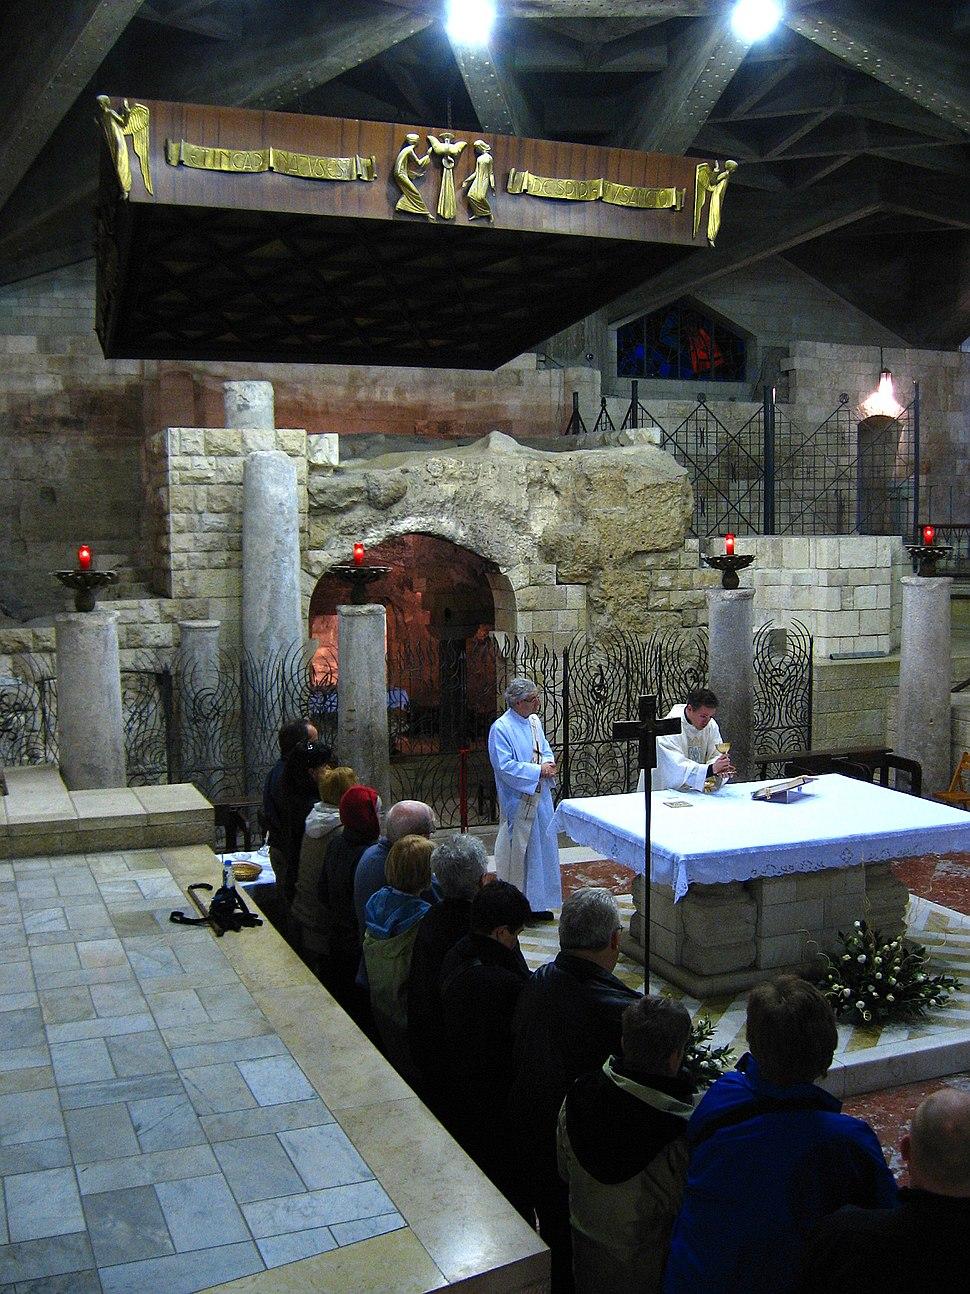 4200-20080119-0624UTC--nazareth-church-of-the-annunciation-grotto